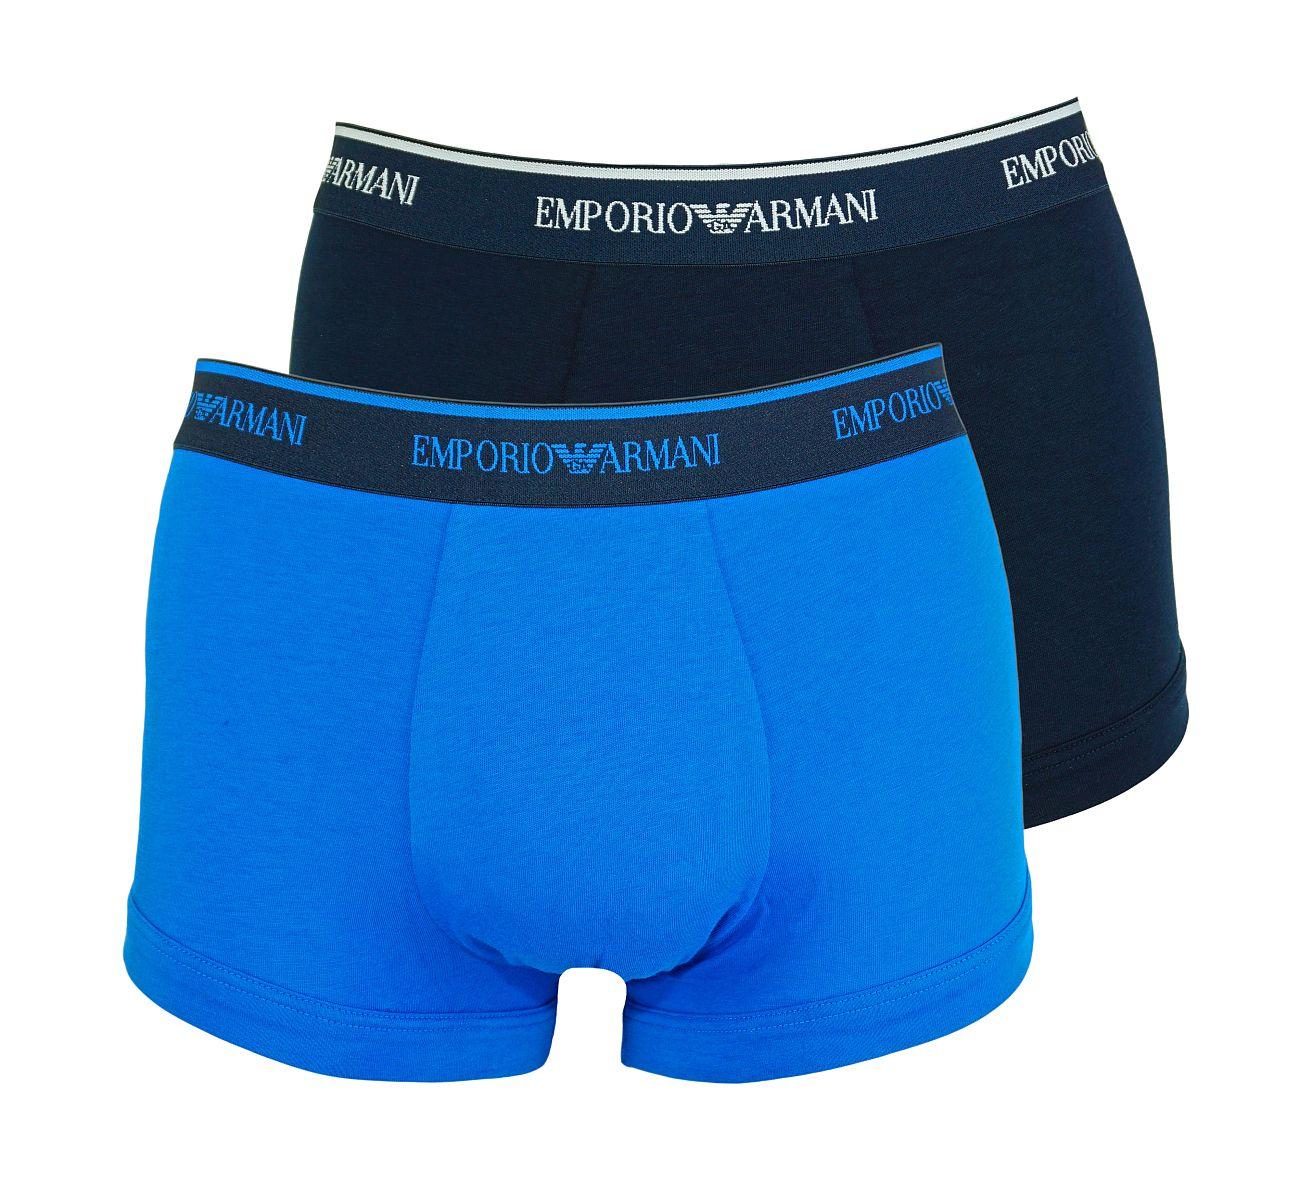 Emporio Armani 2er Pack Shorts Trunk Unterhose 111210 8P717 18735 MARINE/CIELO W18-EAT1